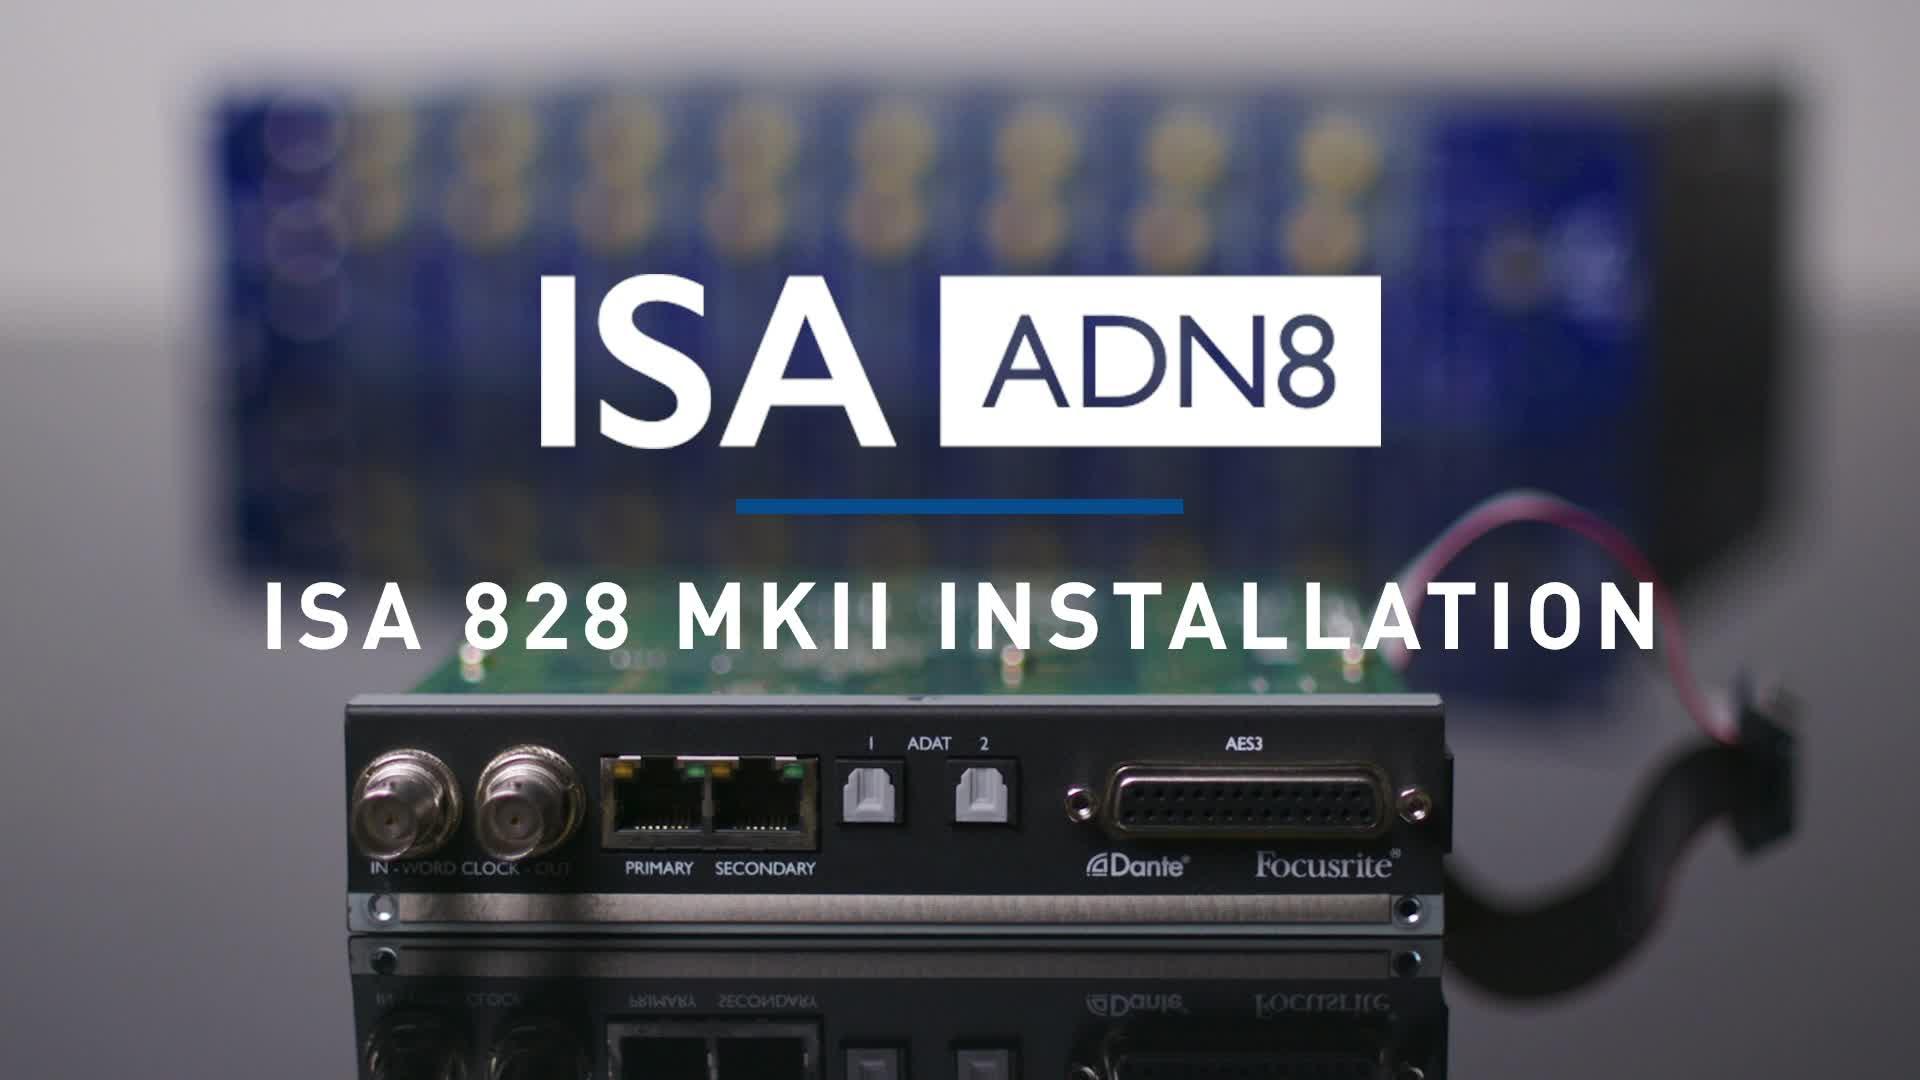 Focusrite - ISA 828 MKII ADN8 Card Installation